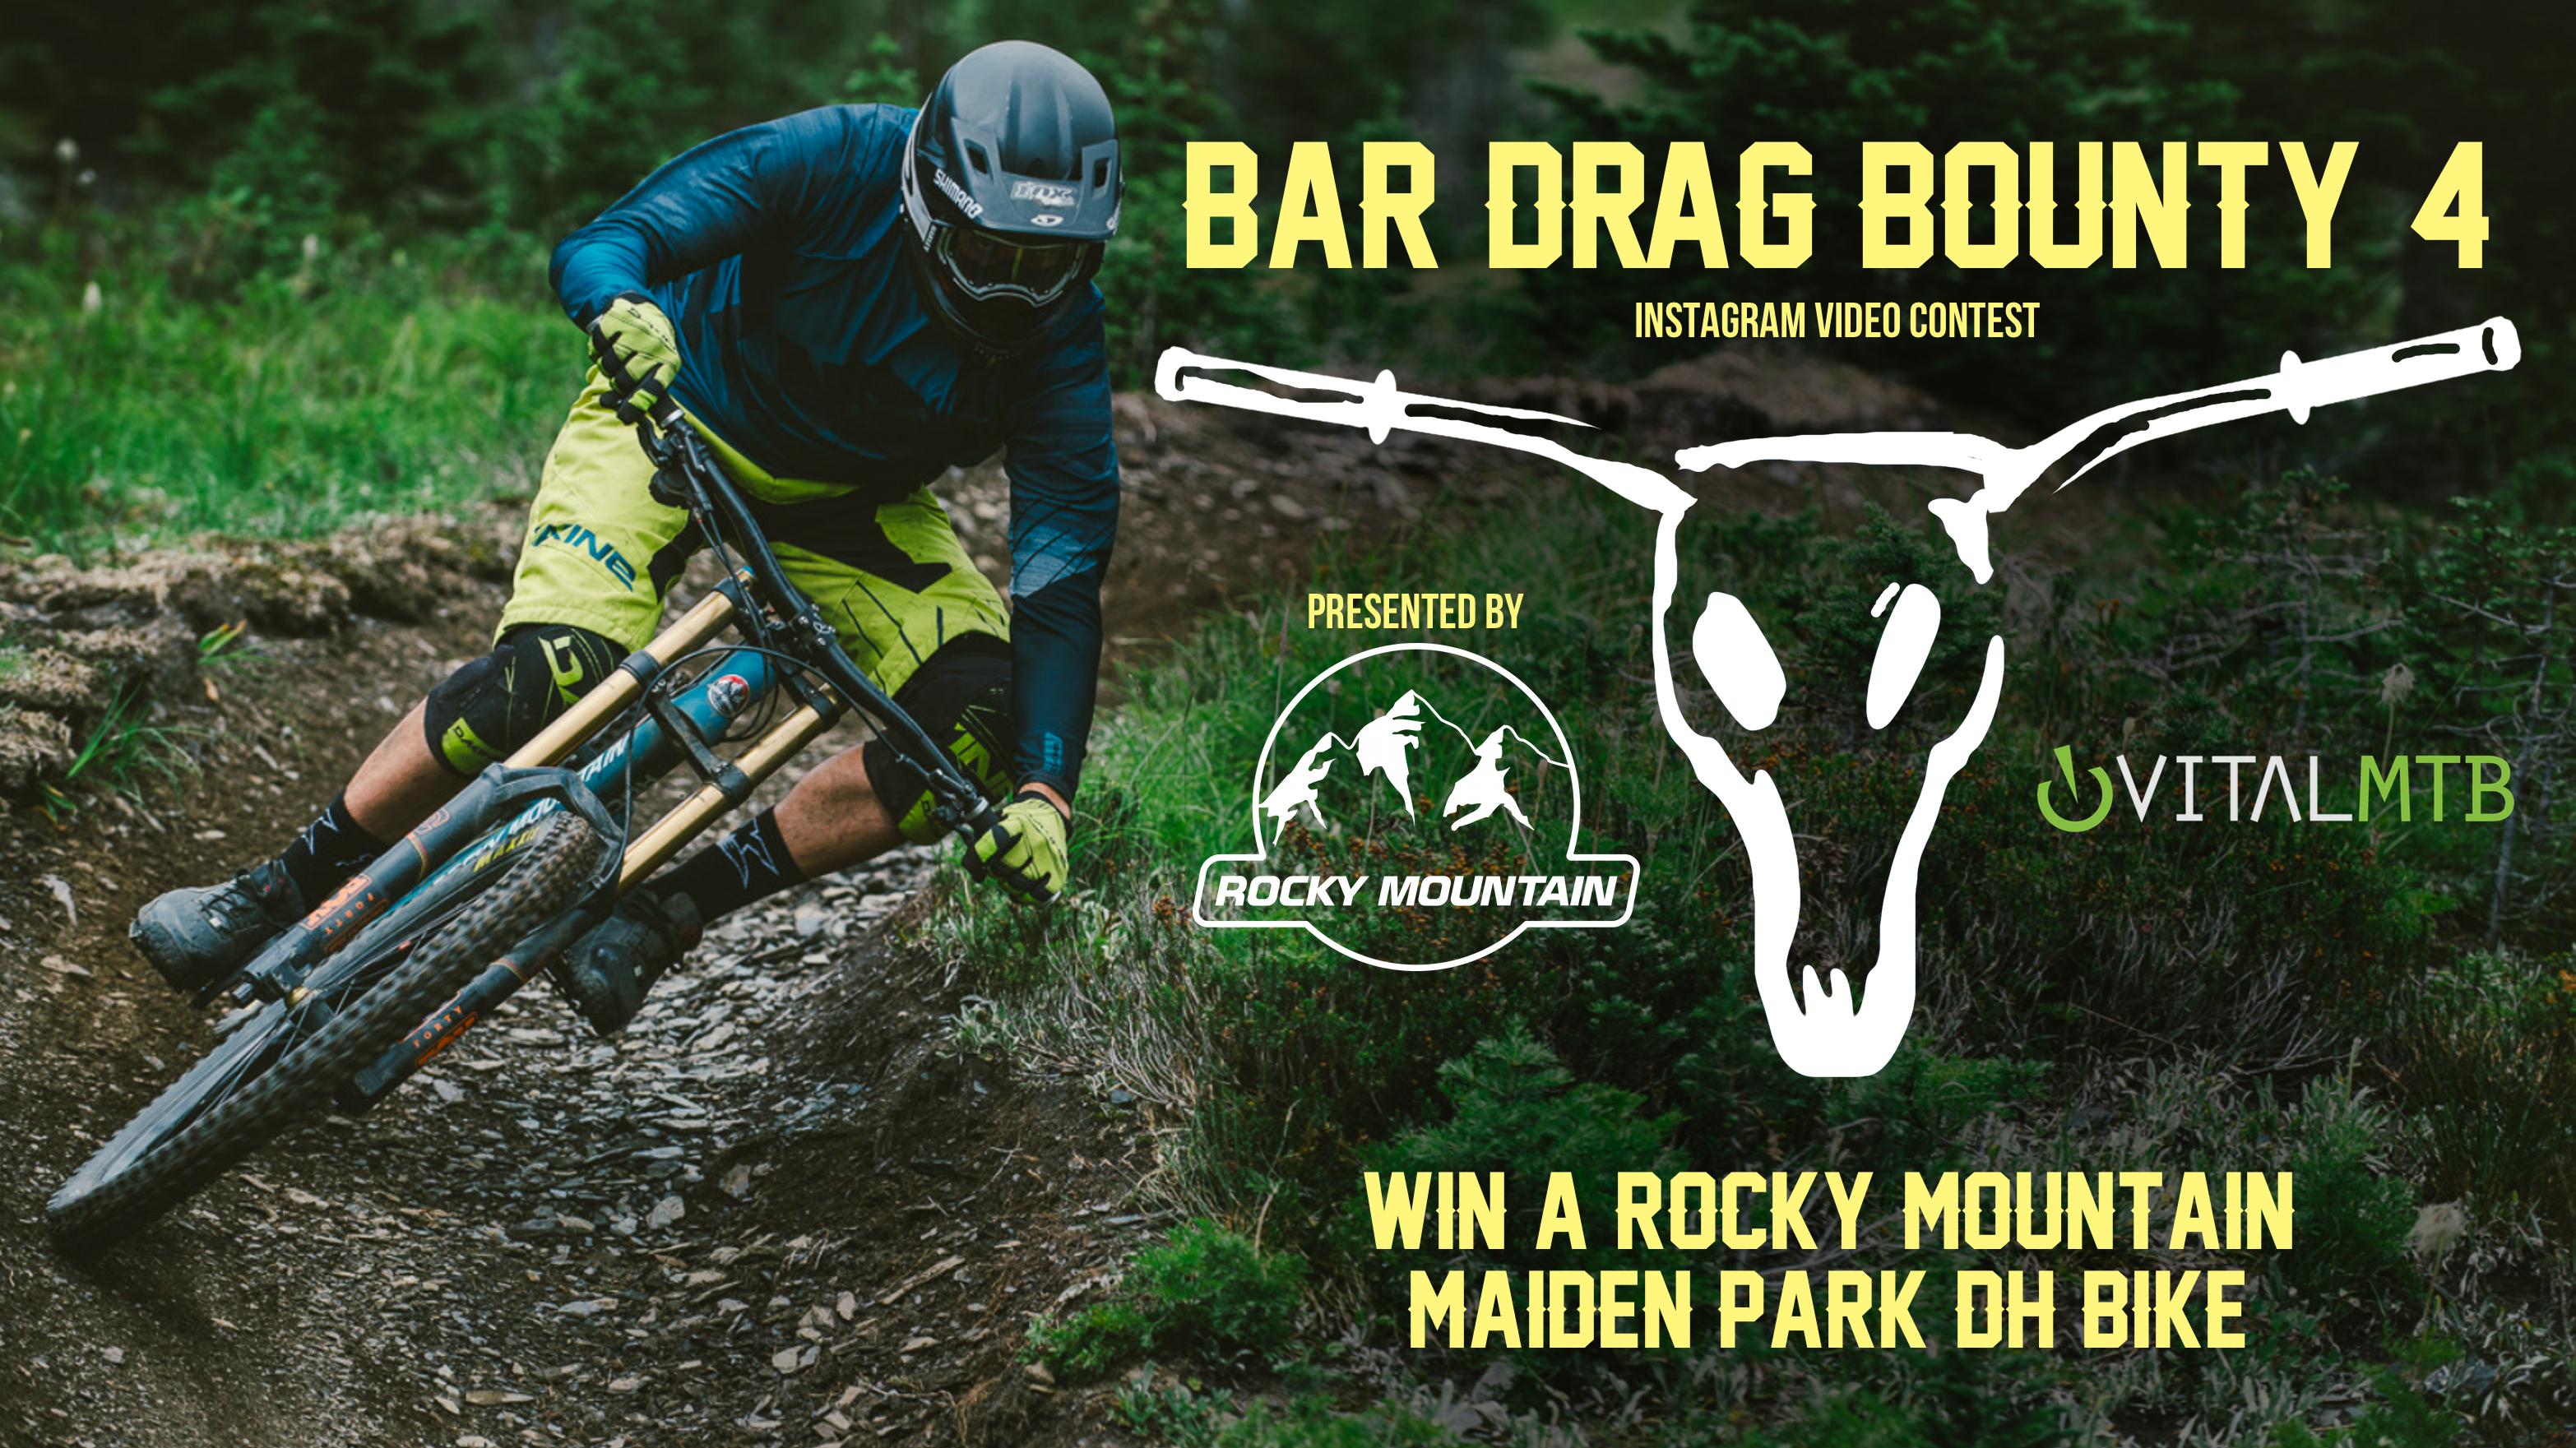 Bar Drag Bounty is Back - Win a Rocky Mountain Maiden Park DH Bike